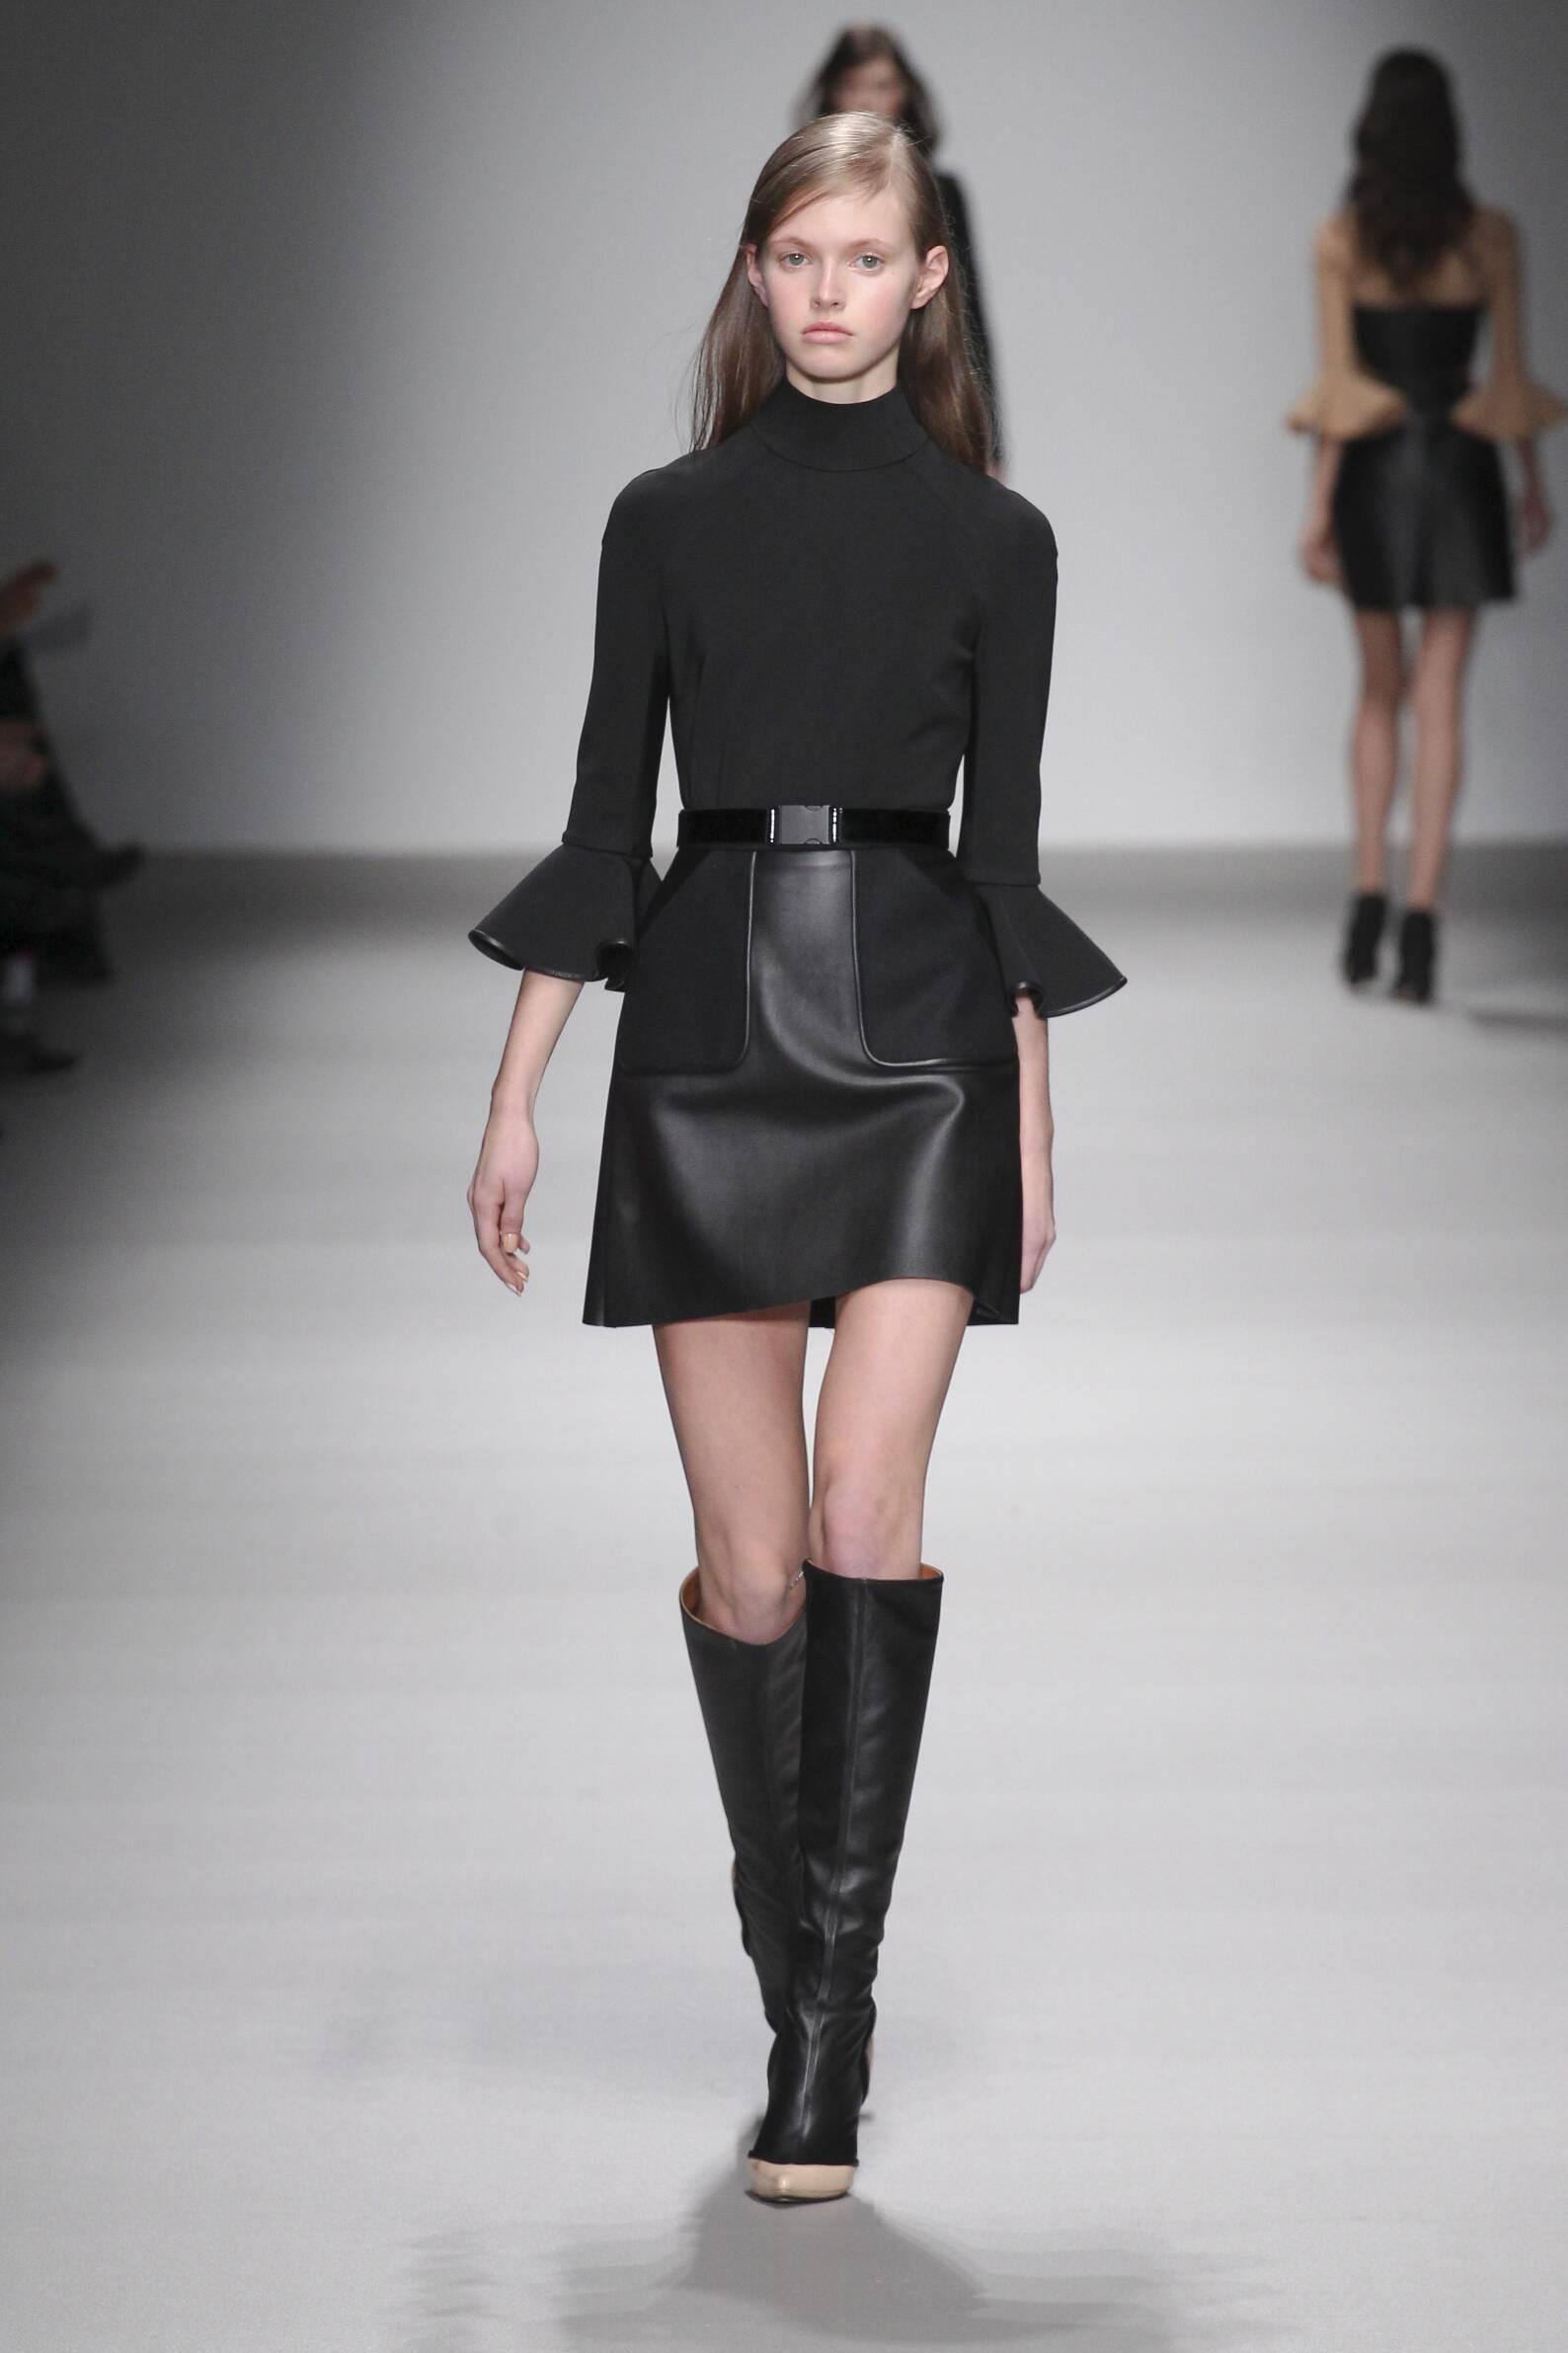 2016 Fall Fashion Woman David Koma Collection